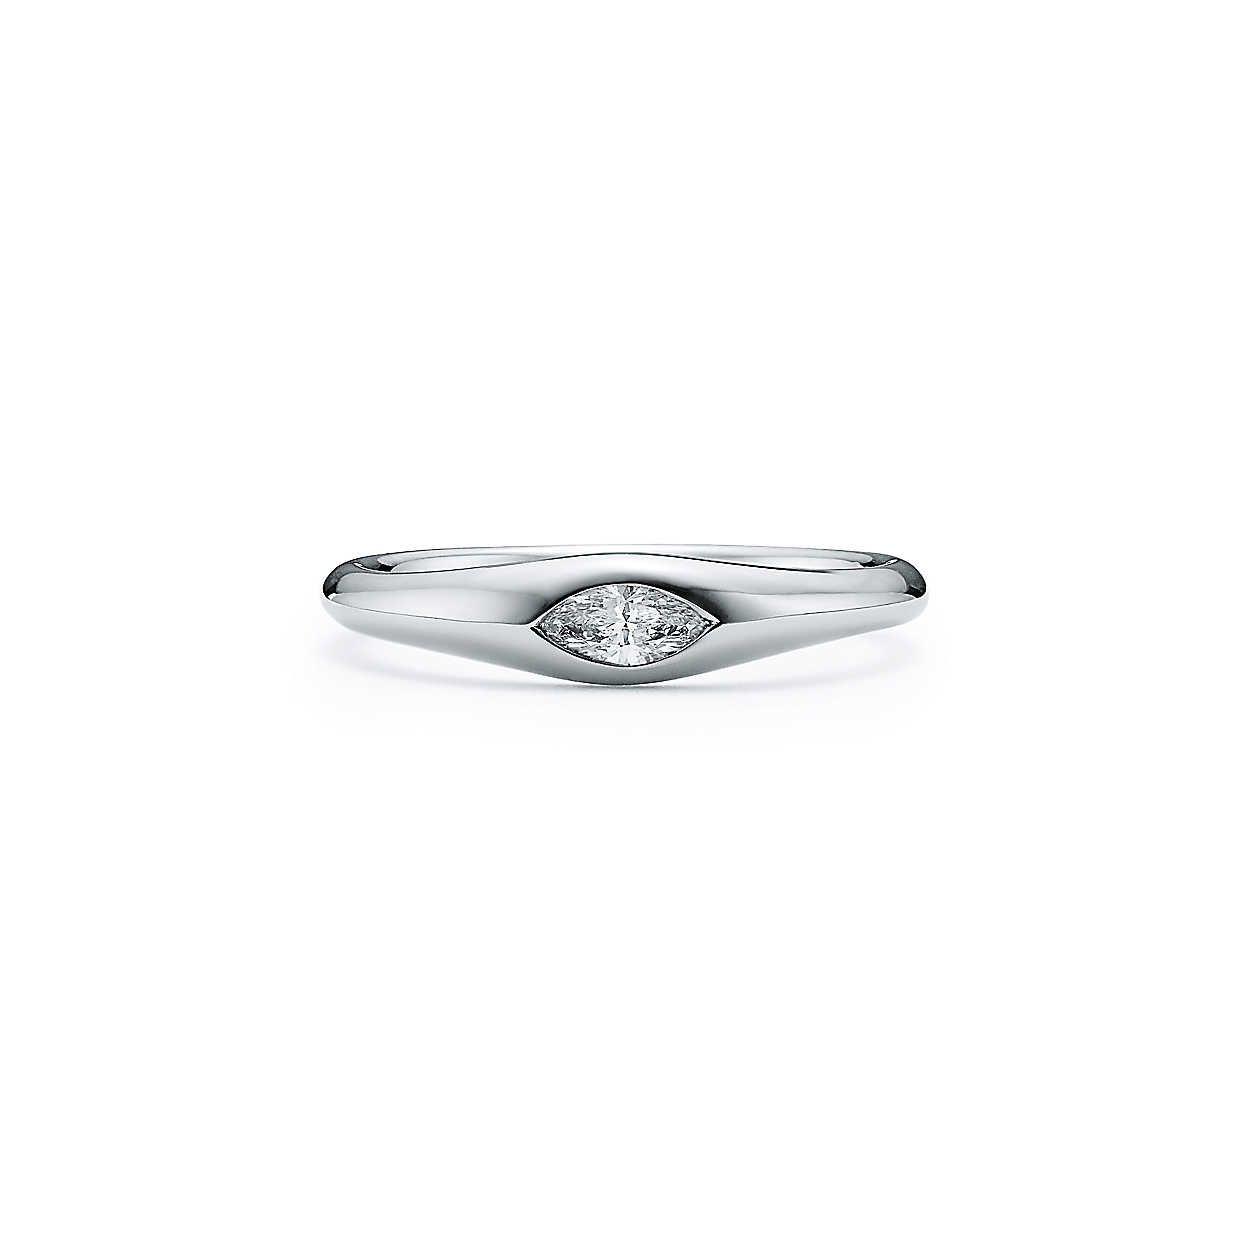 Small platinum engagement ring